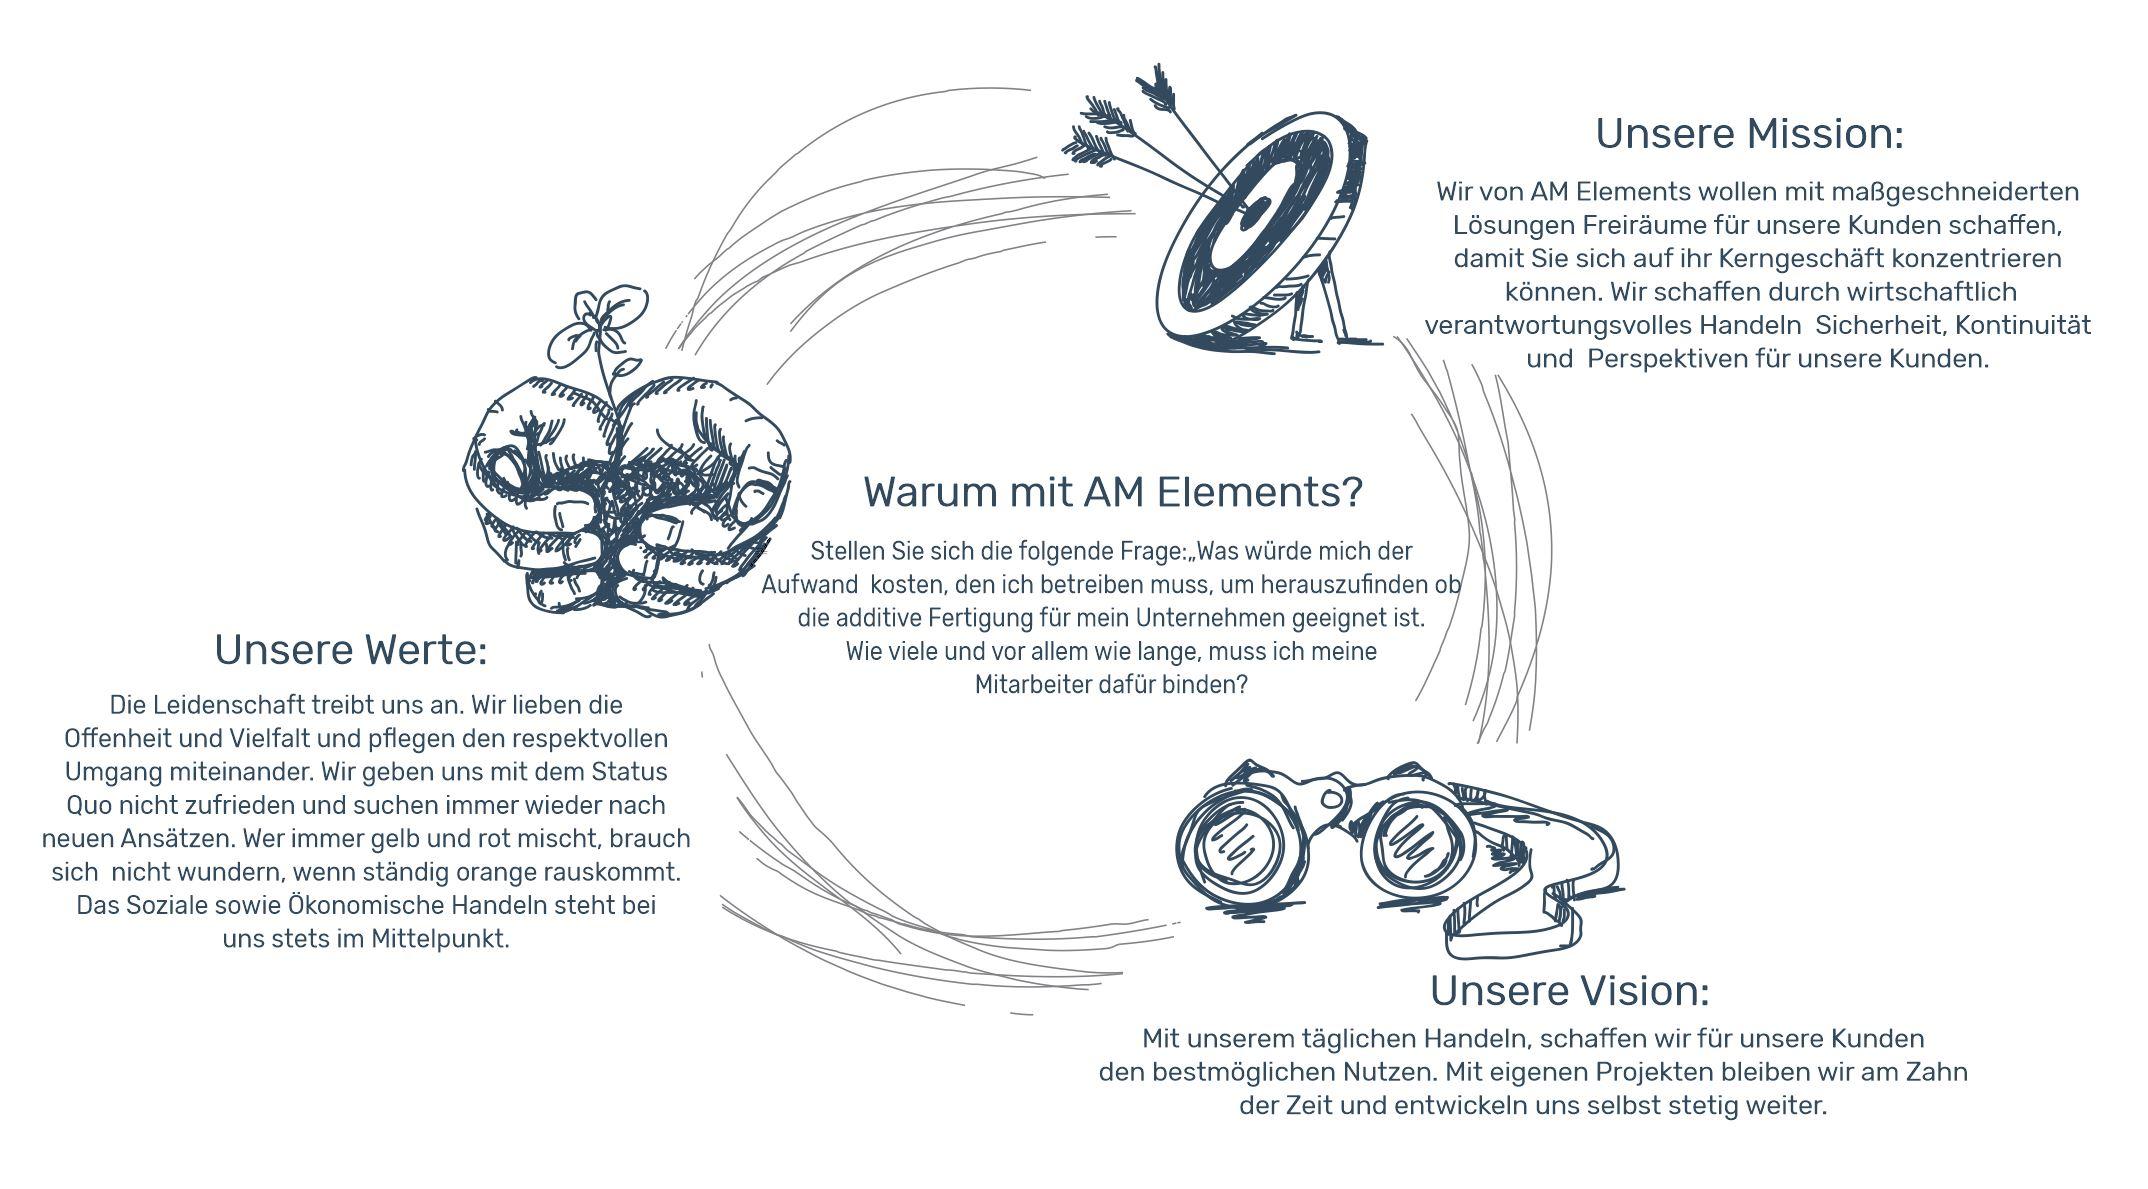 amelements_warumwir